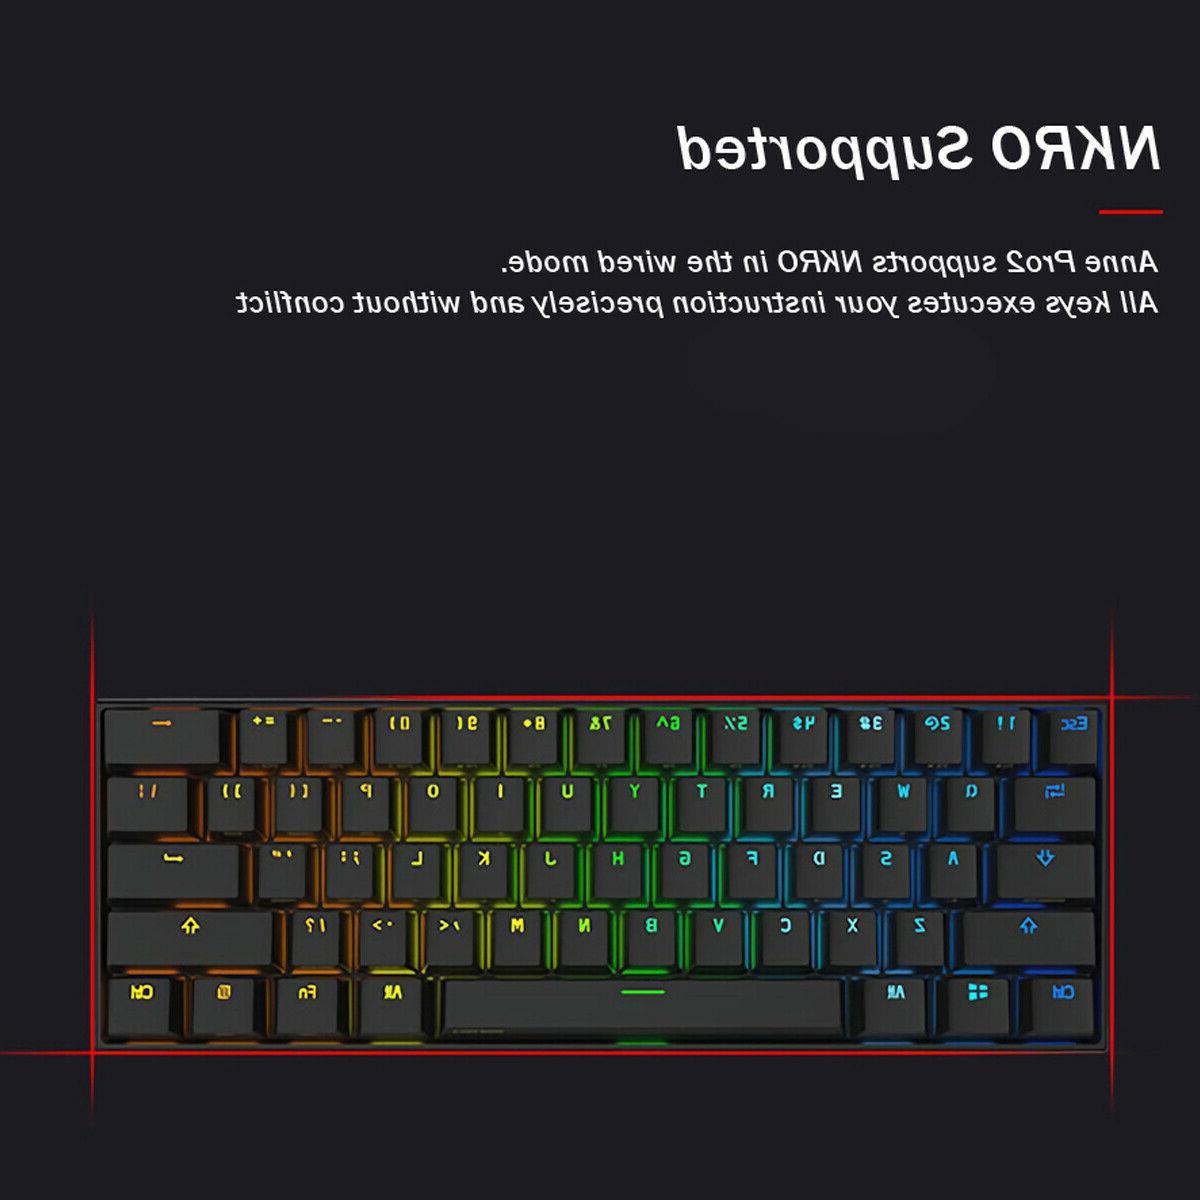 Obins Anne Pro 2 60% RGB Mechanical Gaming Keyboard Switch